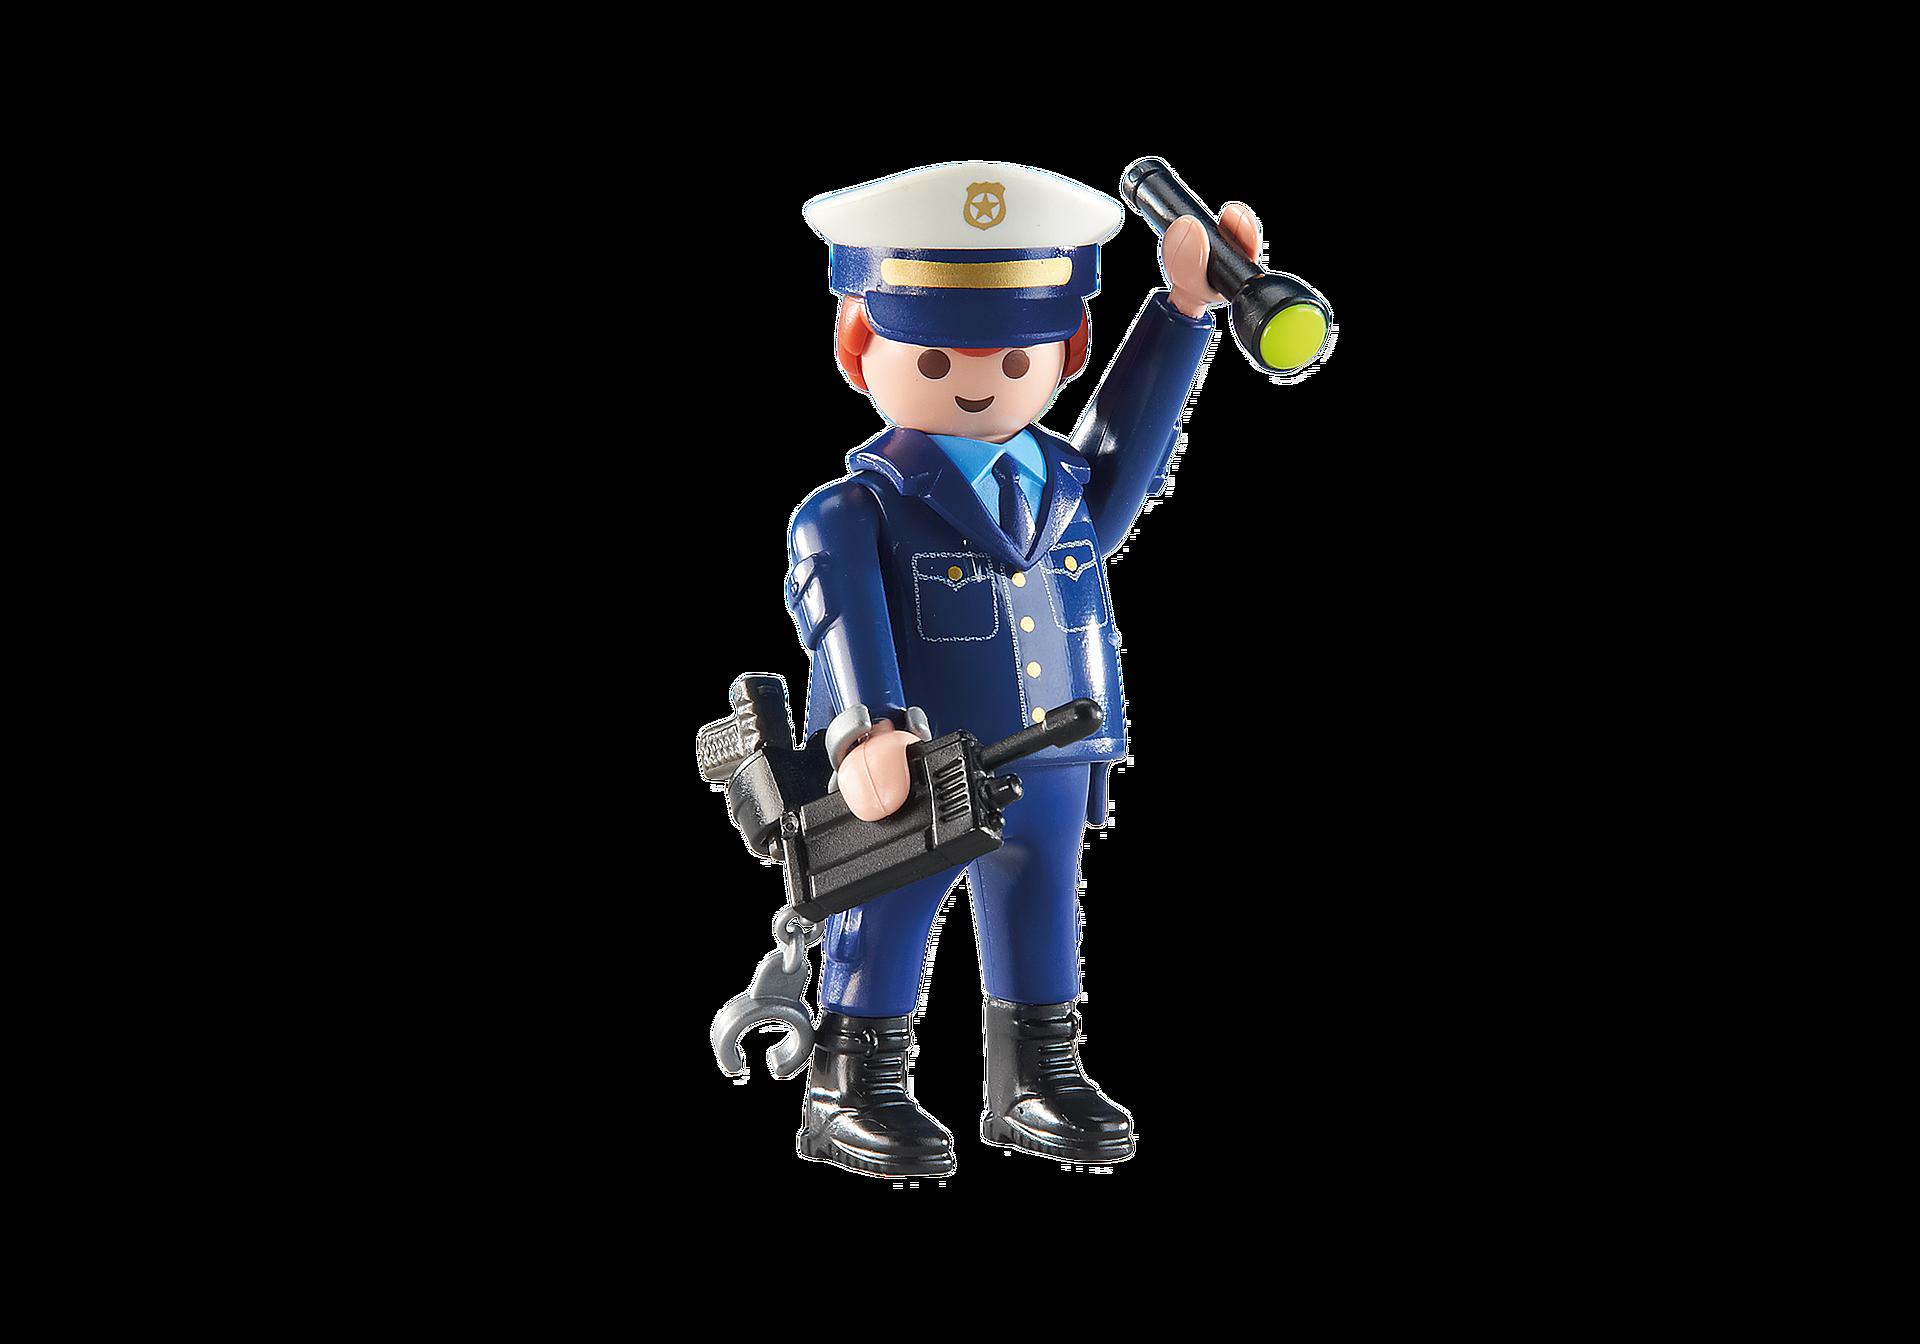 http://media.playmobil.com/i/playmobil/6502_product_detail/Polizeichef